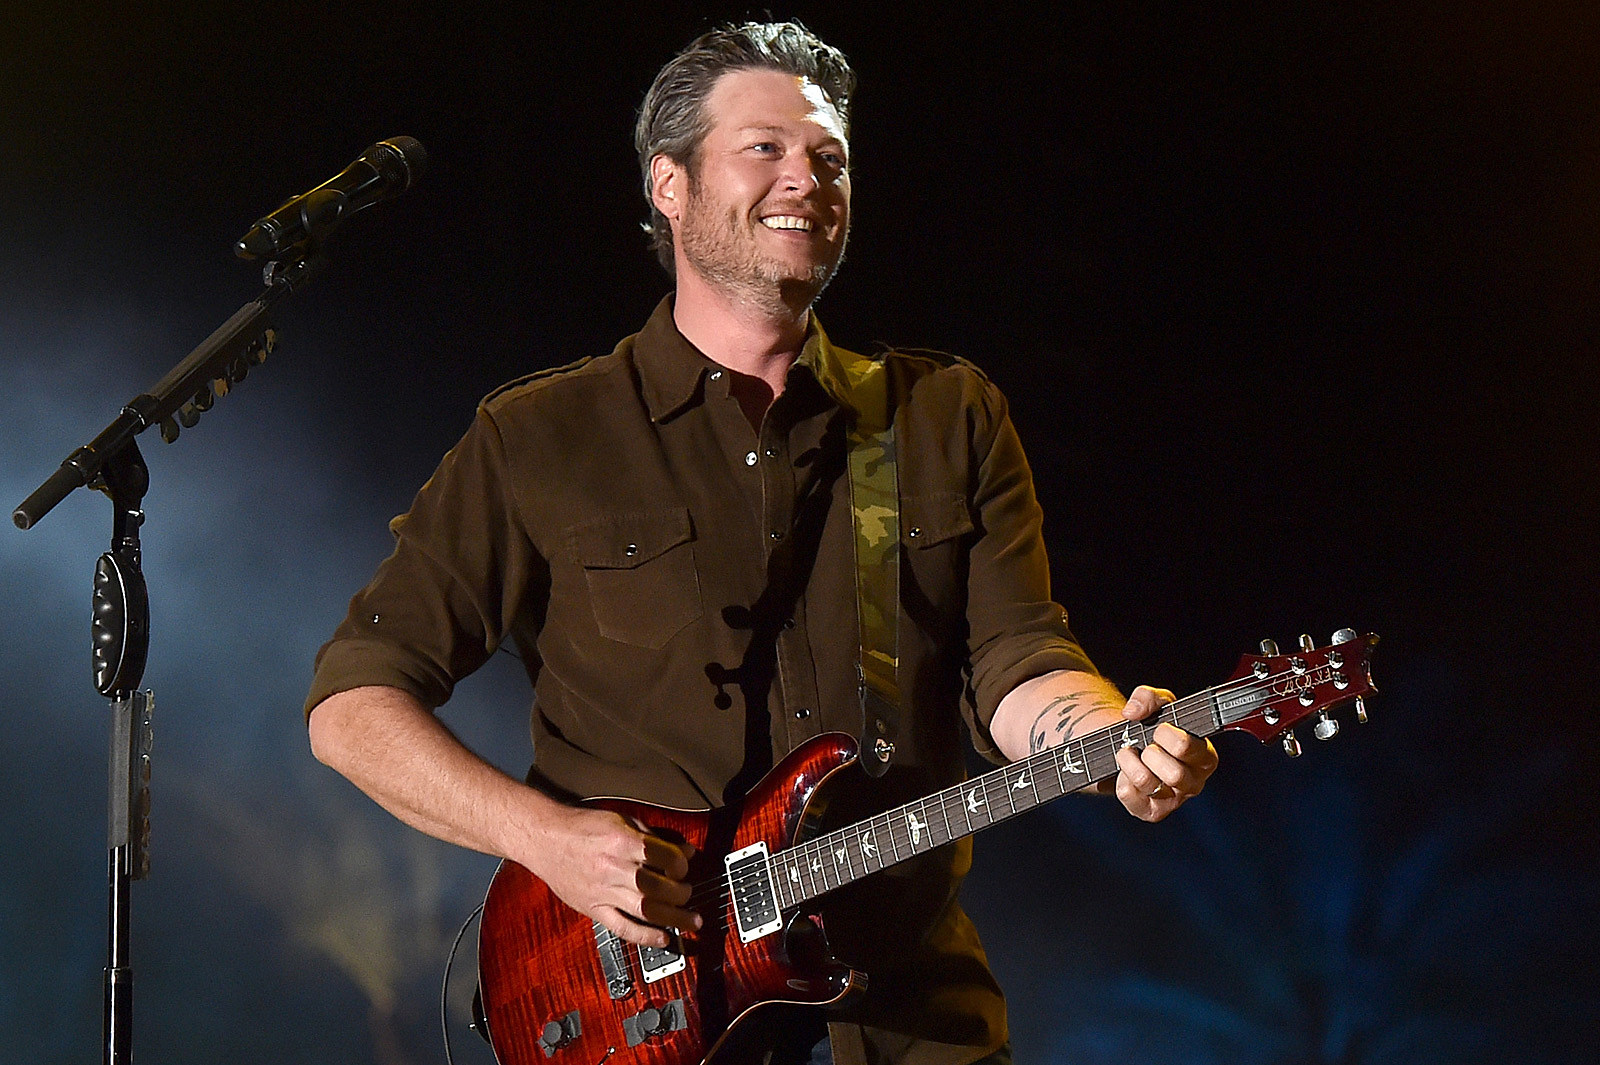 Blake Shelton sets 2014 tour dates